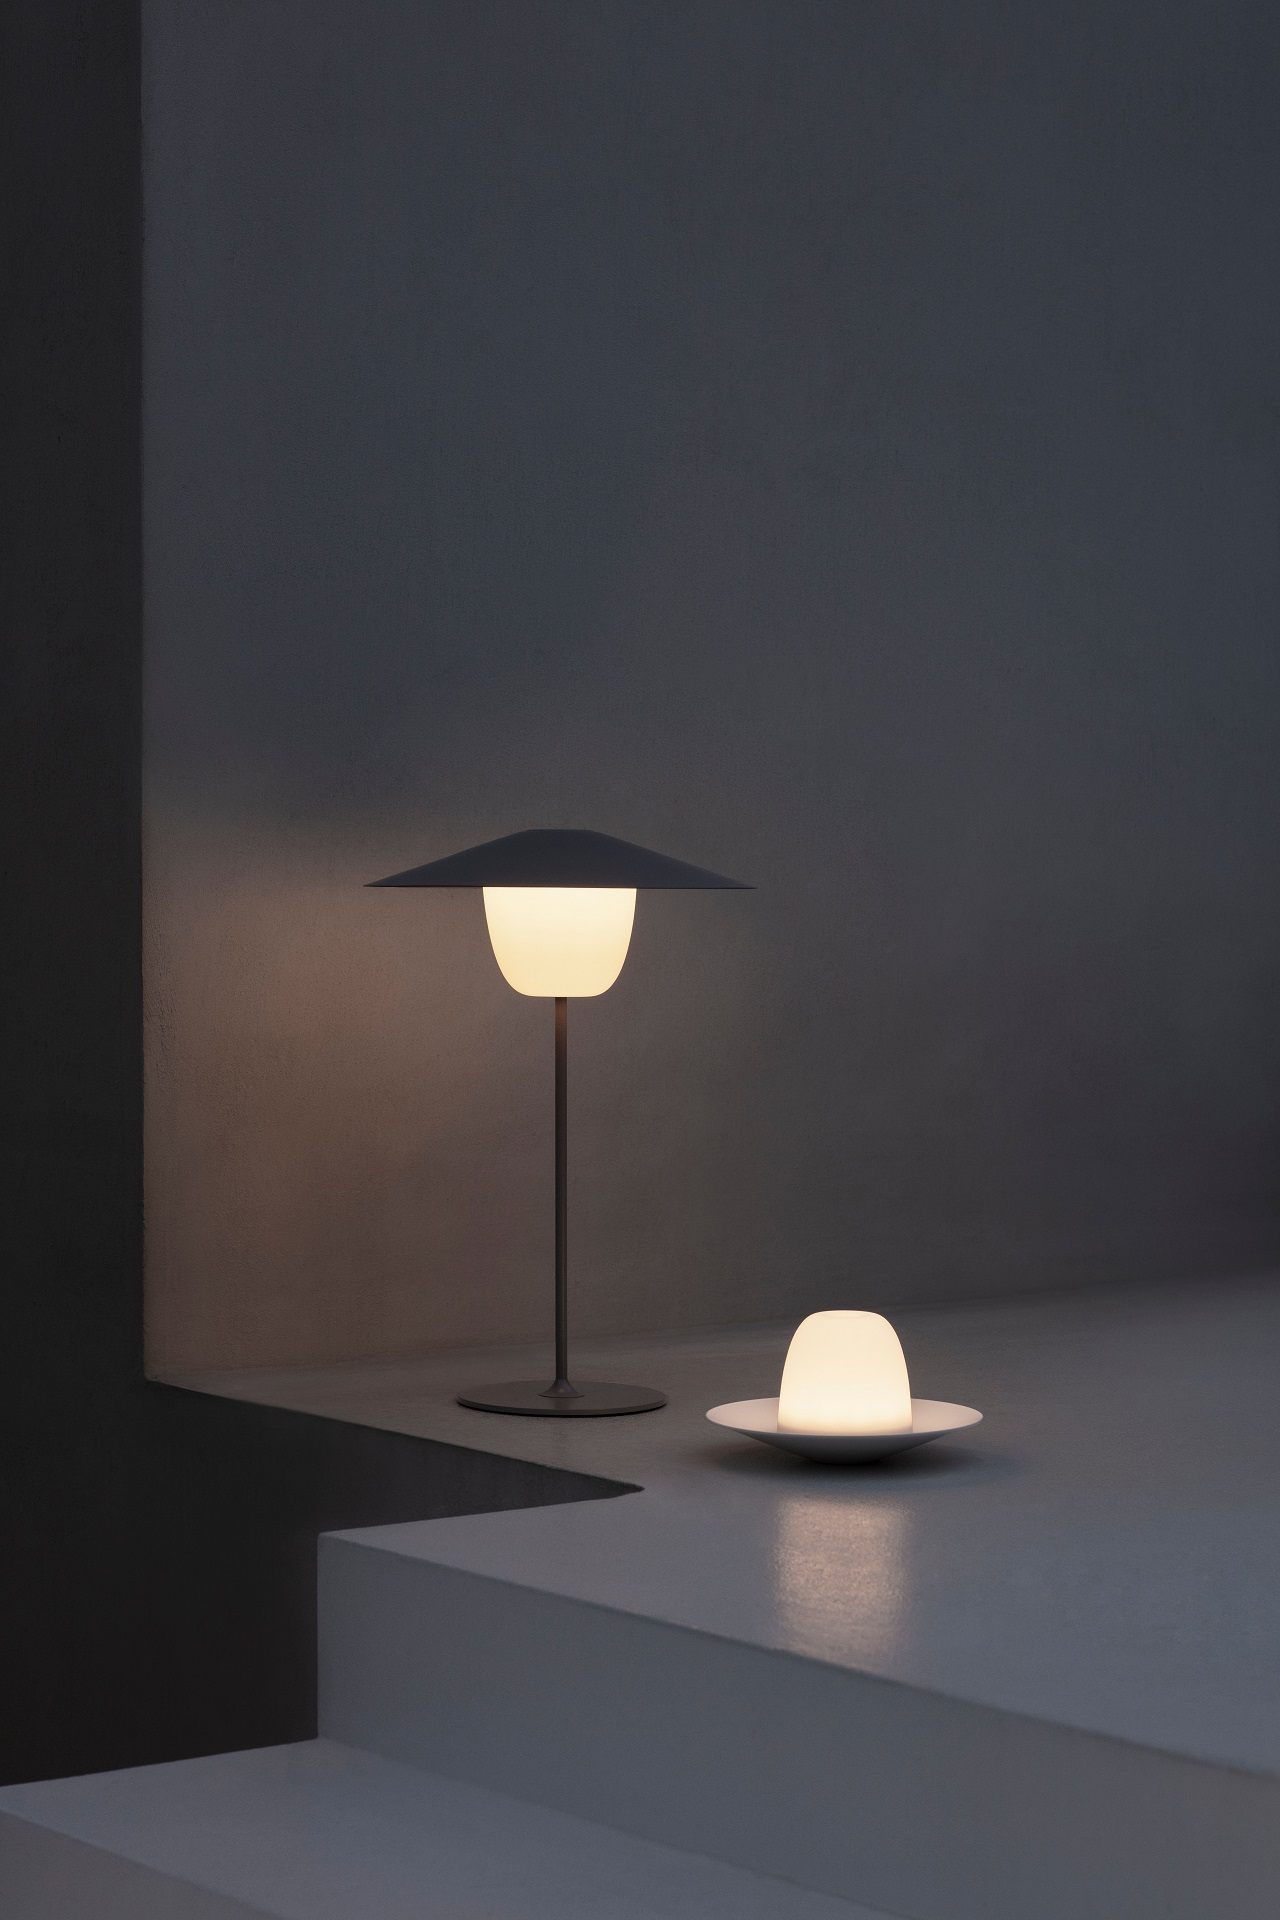 ani_lamp_5127